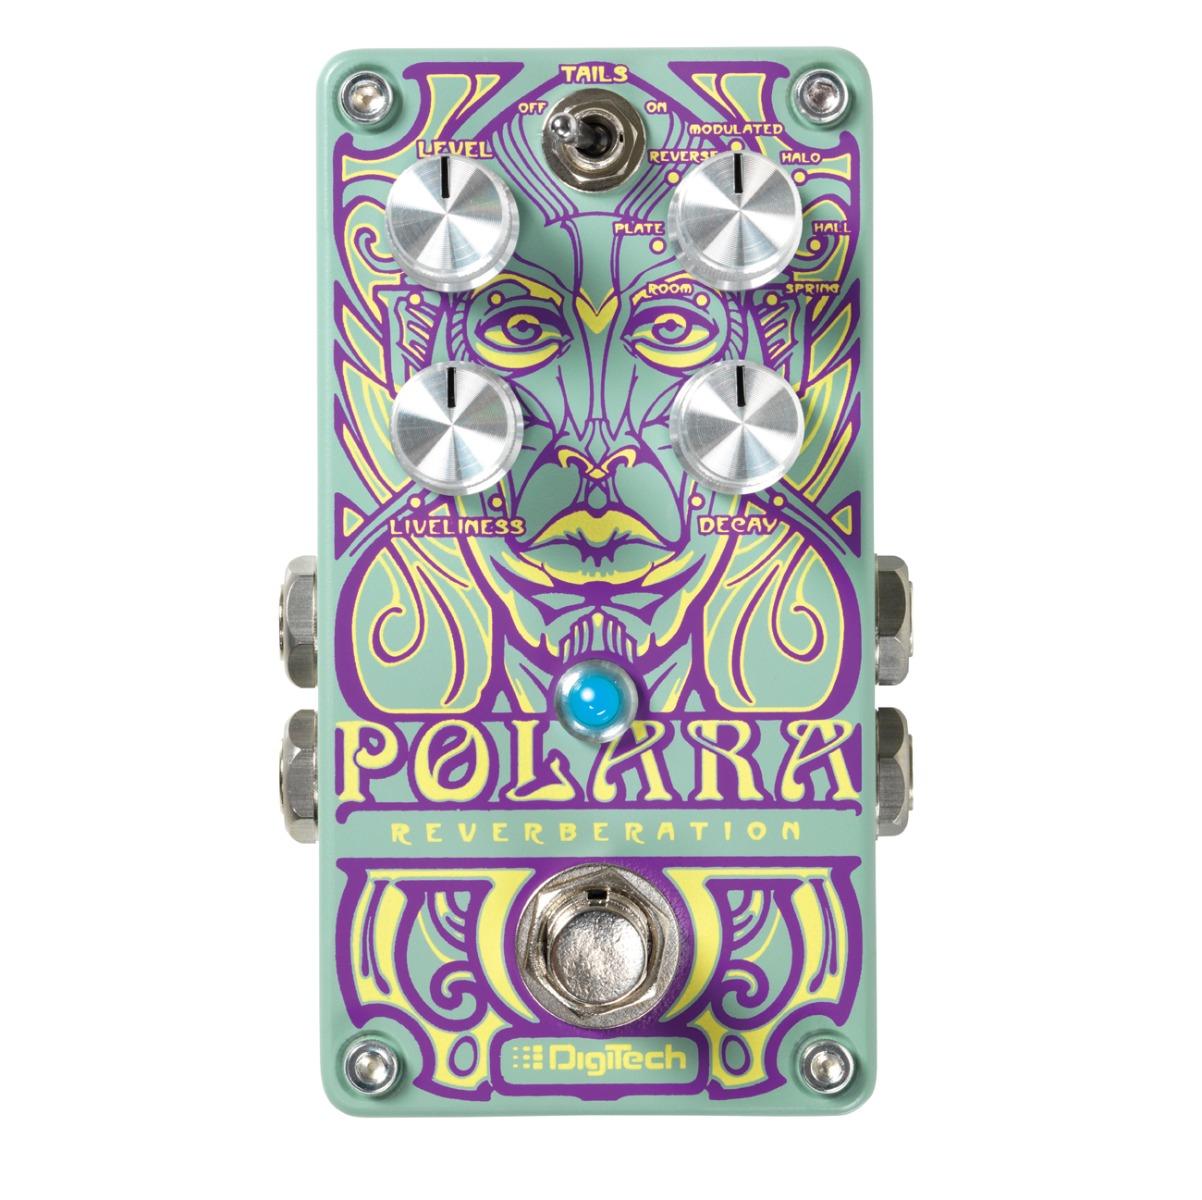 Digitech Polara guitar-effekt-pedal